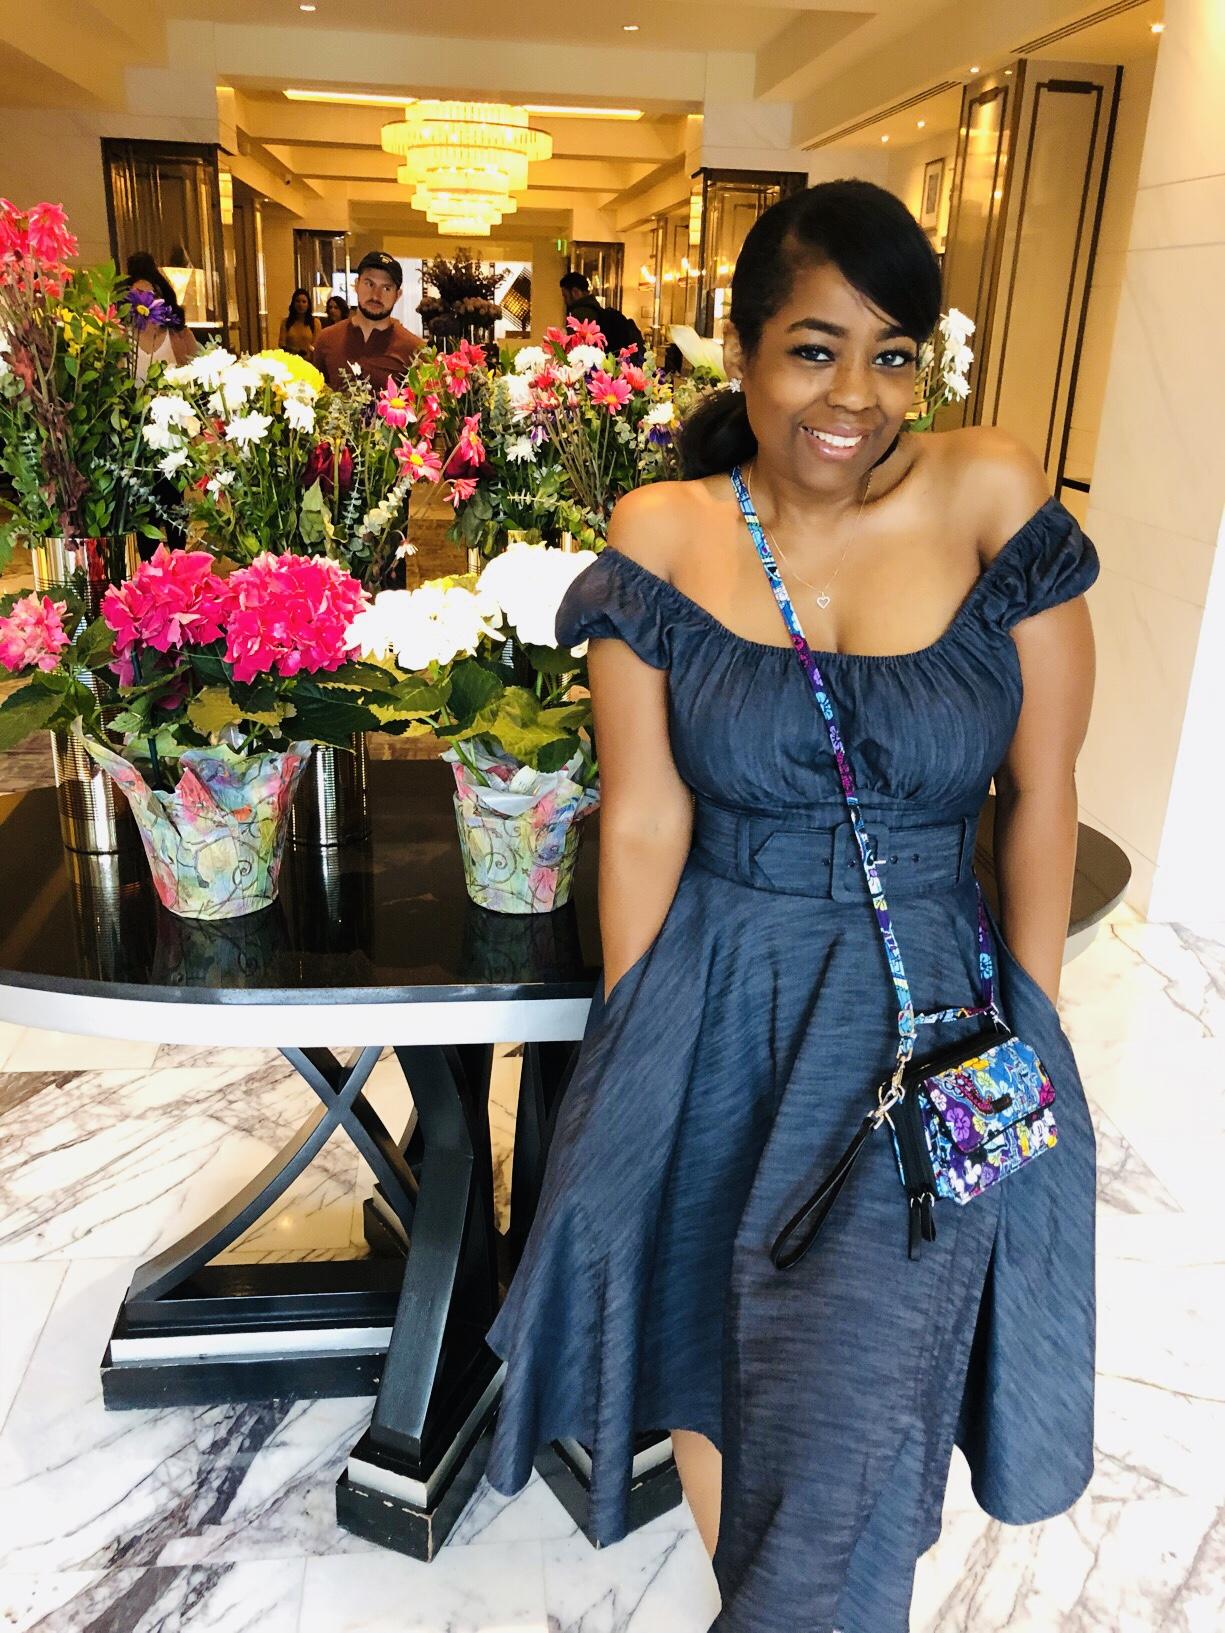 My Style: Pinup Girl Clothing Doris Skirt & Top Set